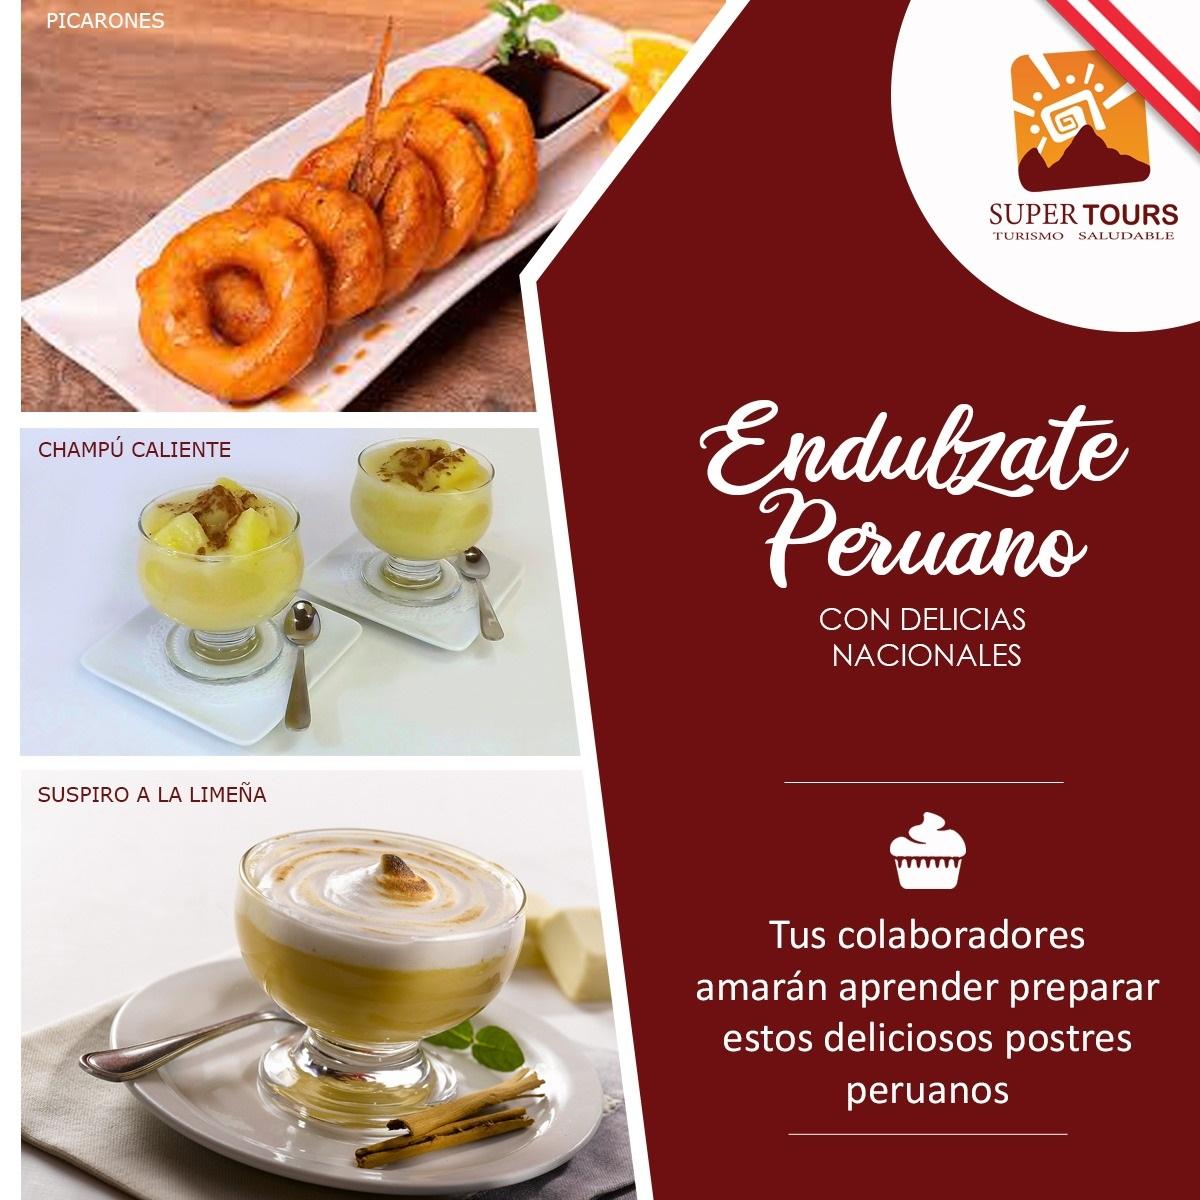 Endúlzate peruano